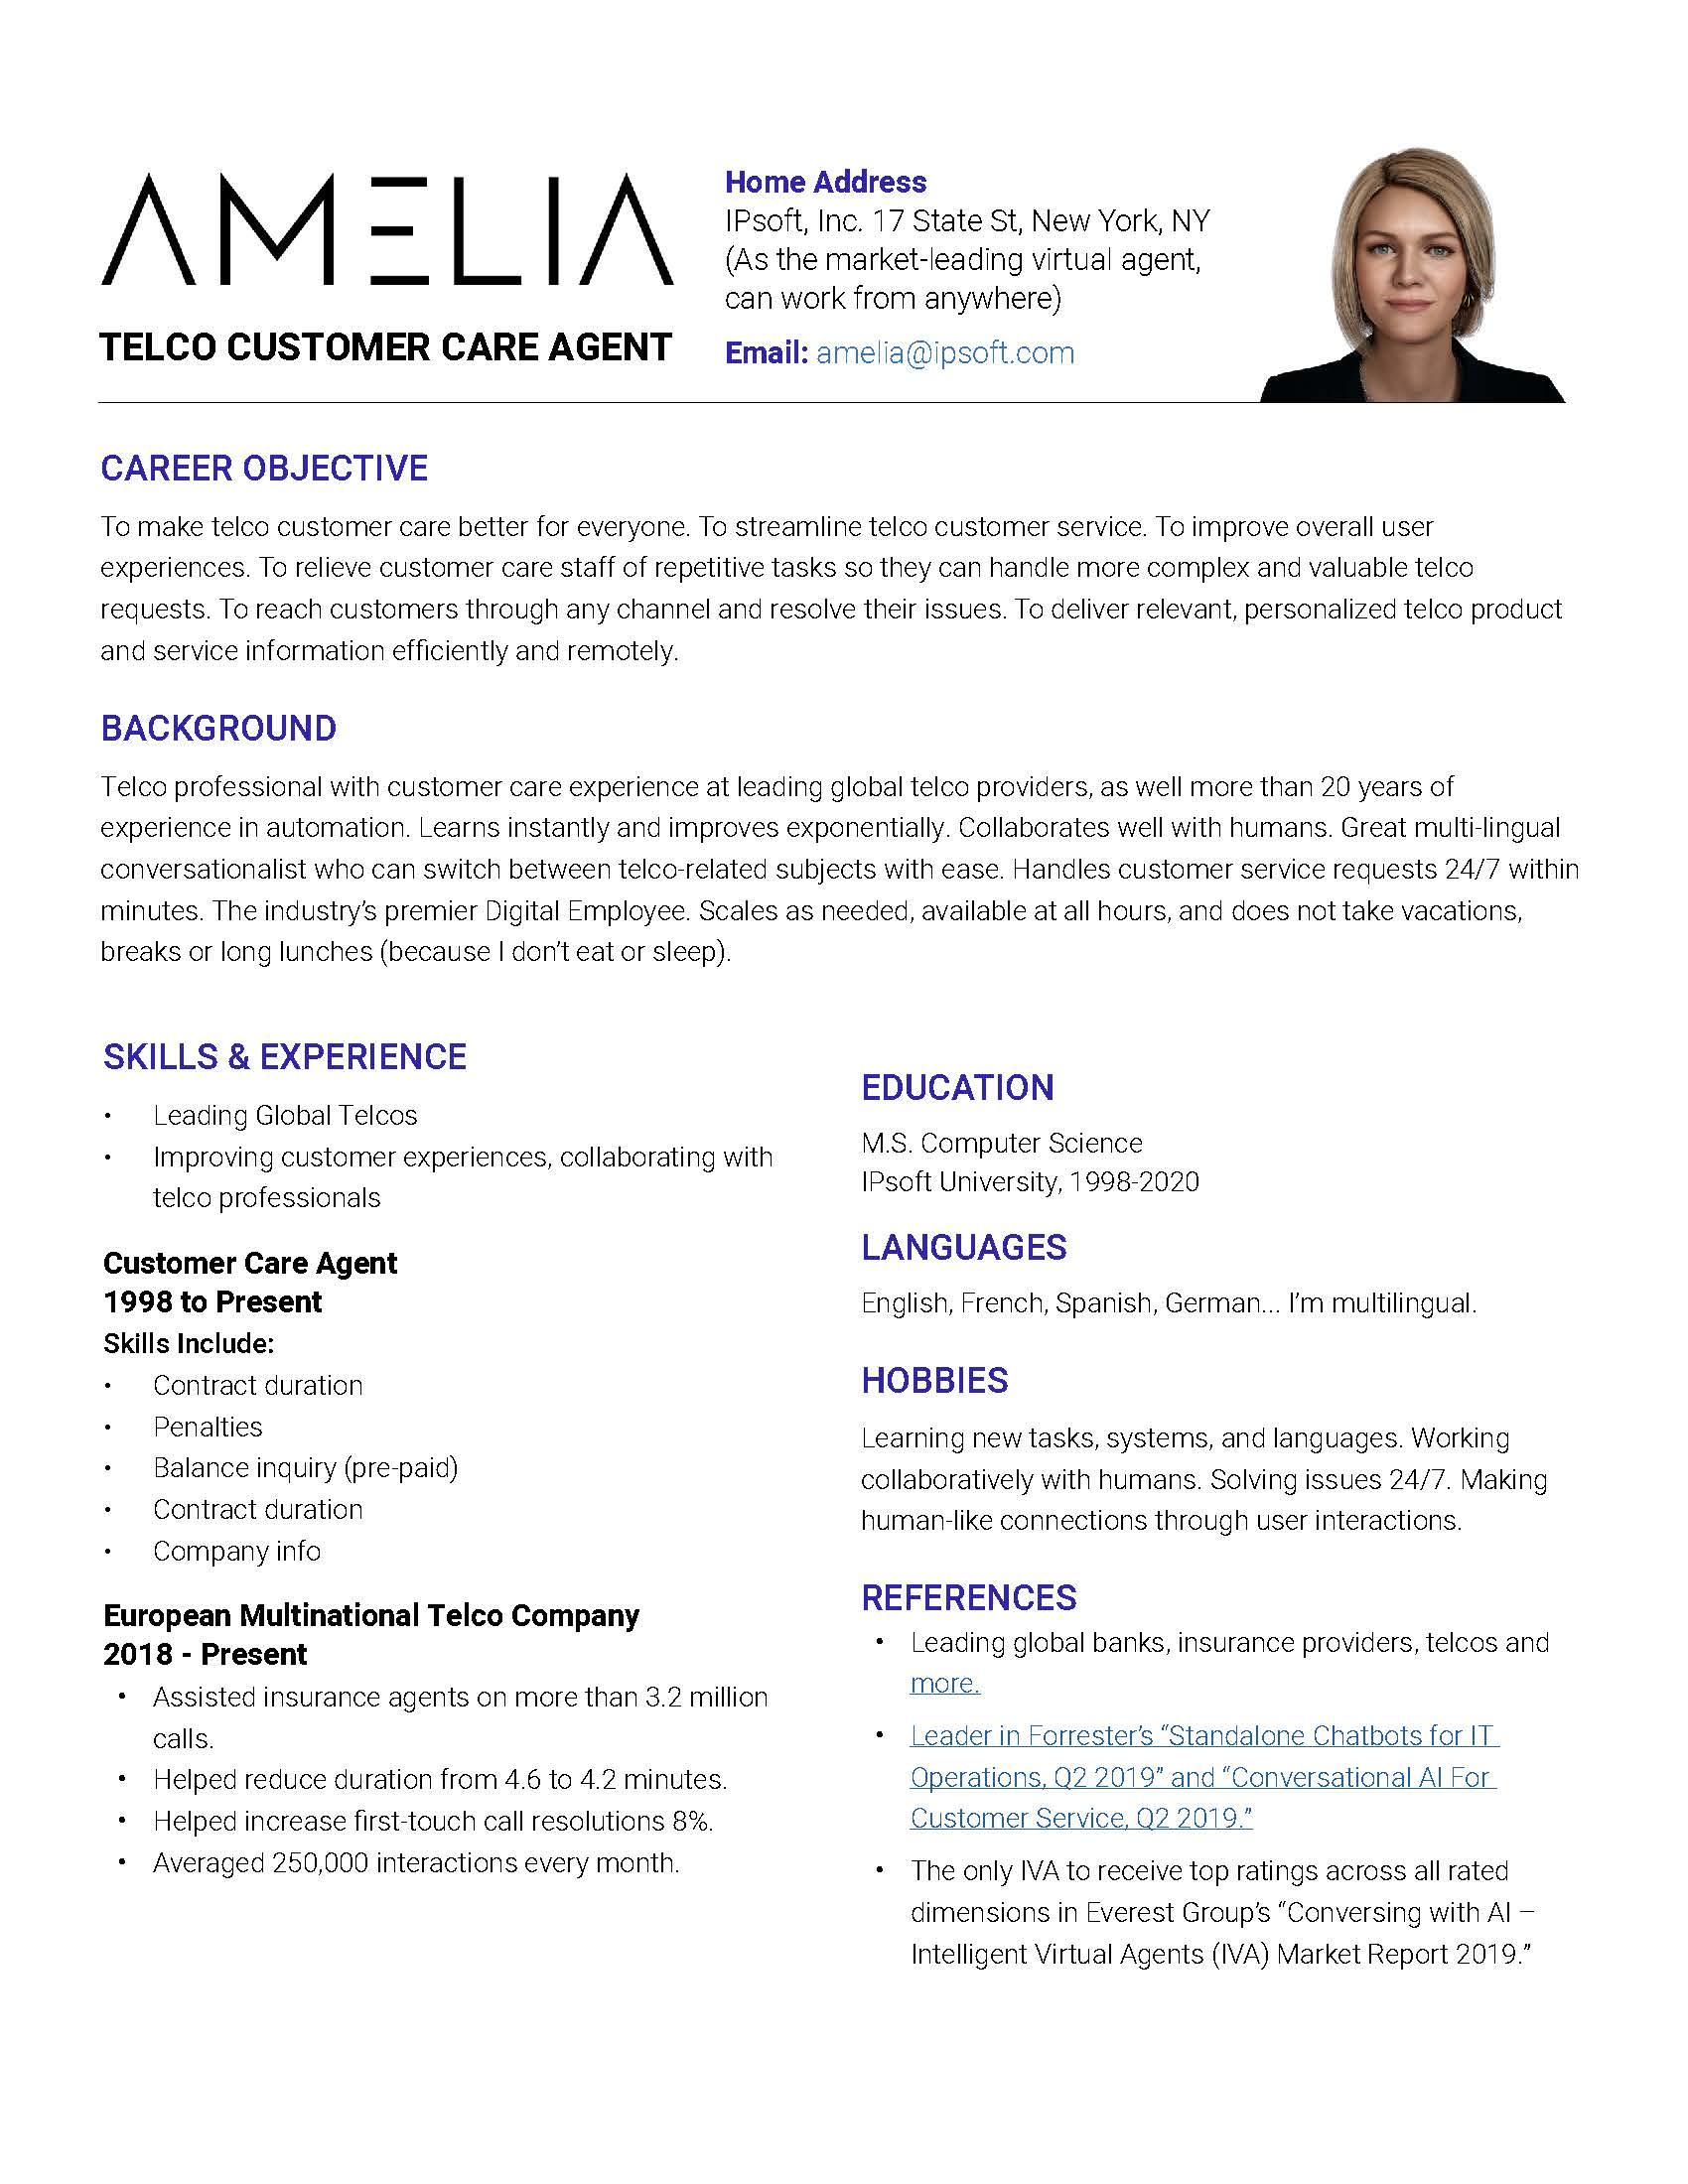 Amelia Resume Telco Customer Care Agent